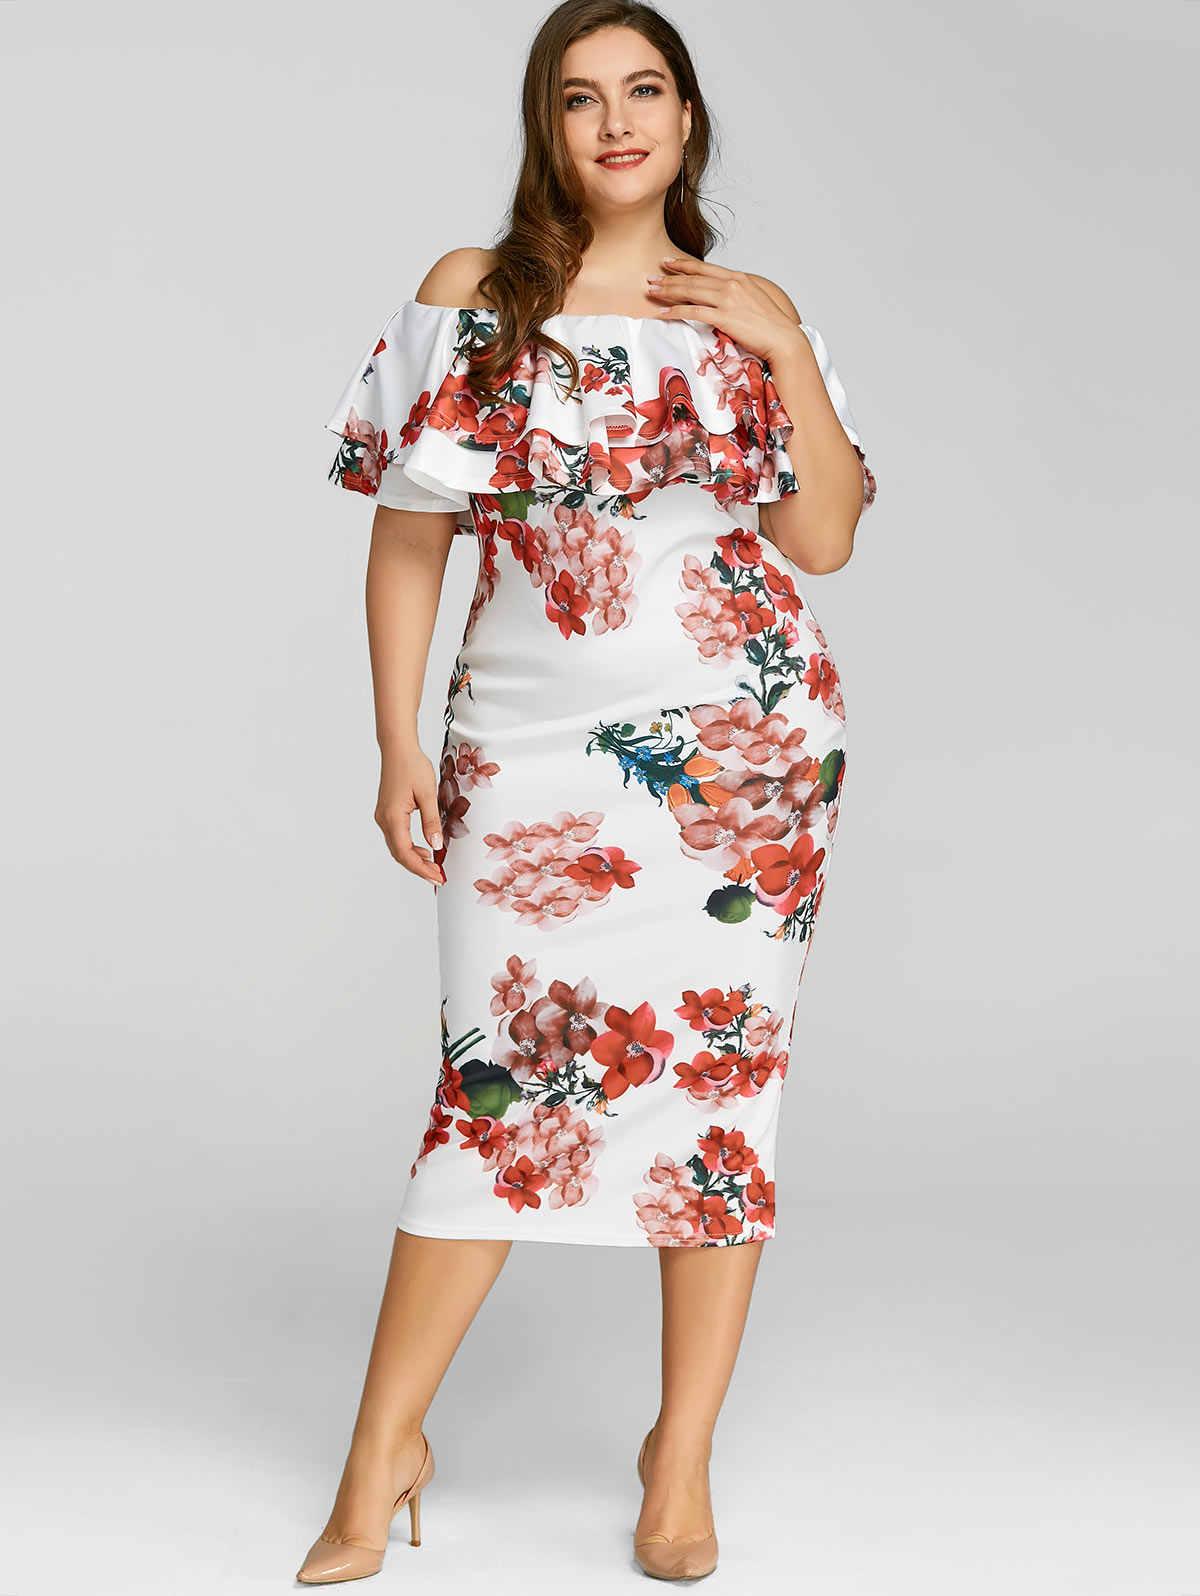 Gamiss Casual Ladies Elegant Bodycon Dress Plus Size 5XL Floral Print  Ruffle Dress Off The Shoulder c70e67223cb1